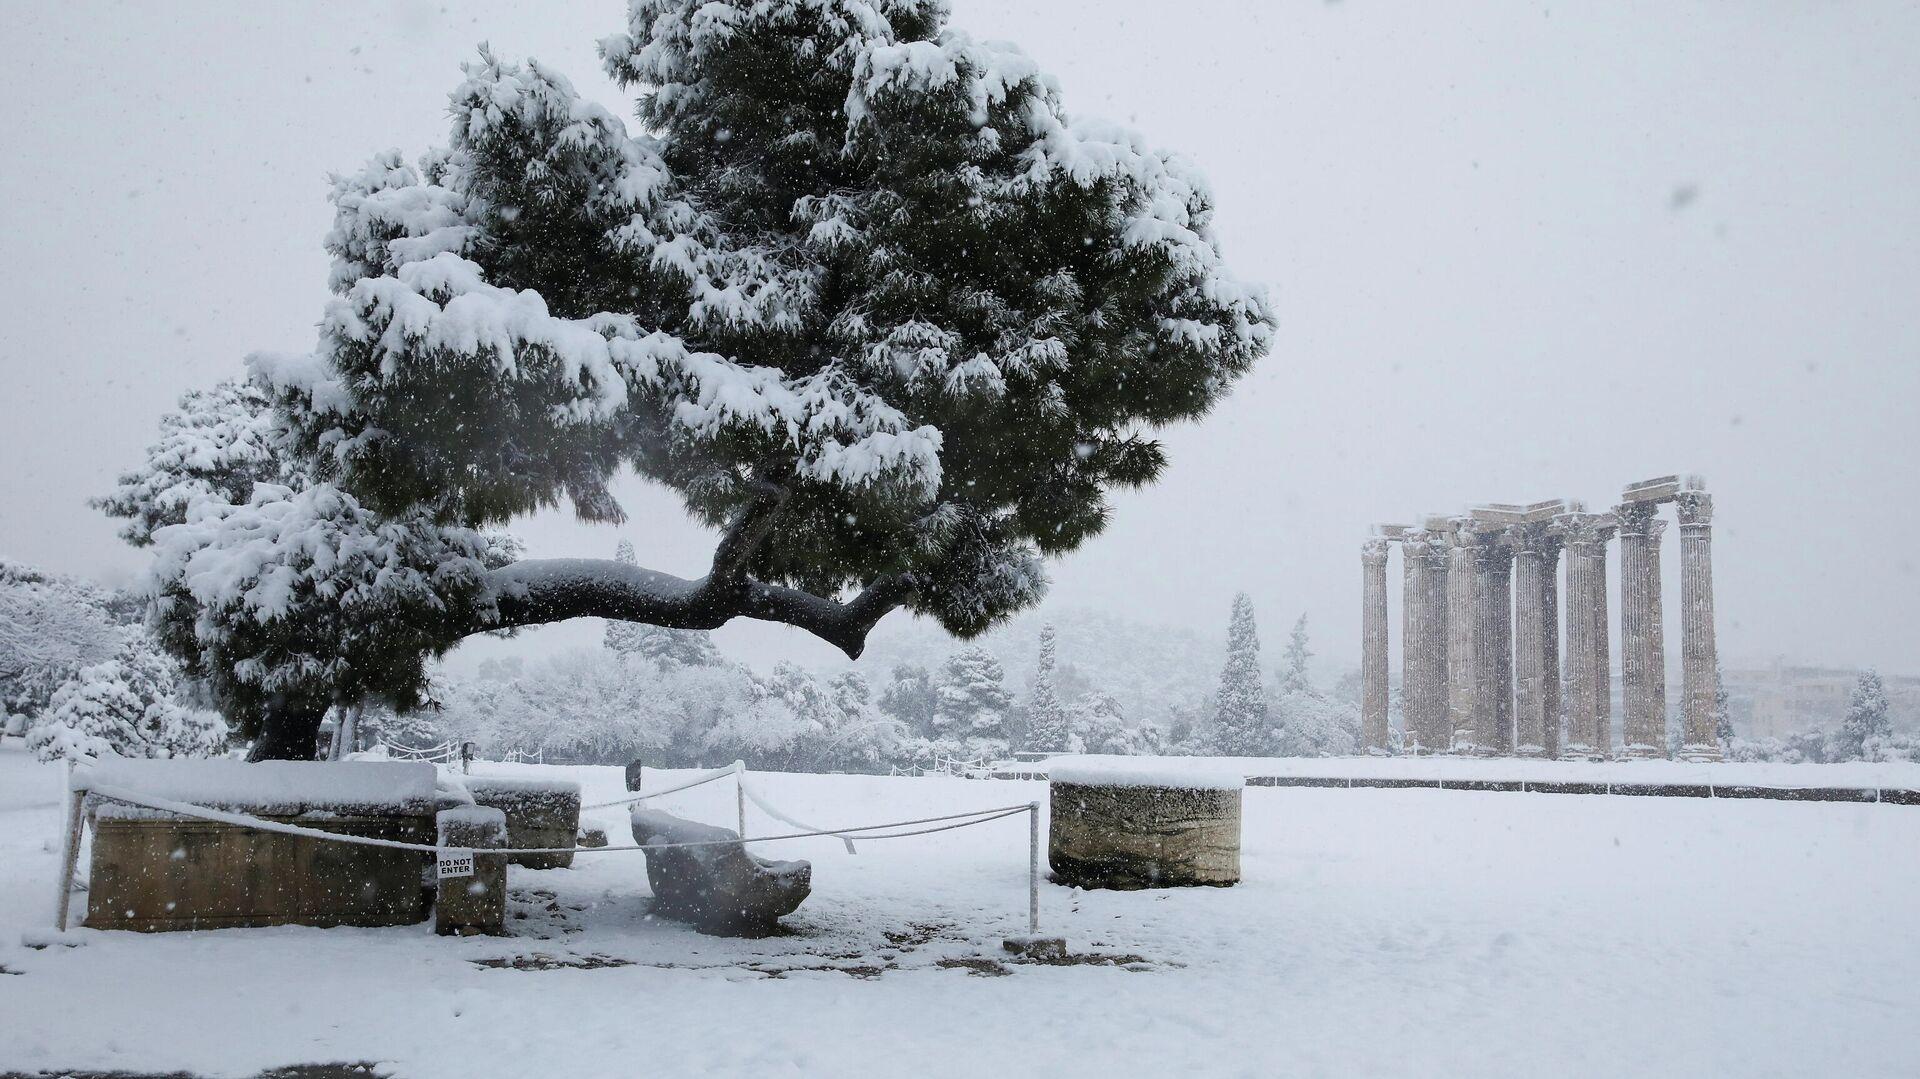 Una fuerte nevada en Atenas - Sputnik Mundo, 1920, 18.02.2021